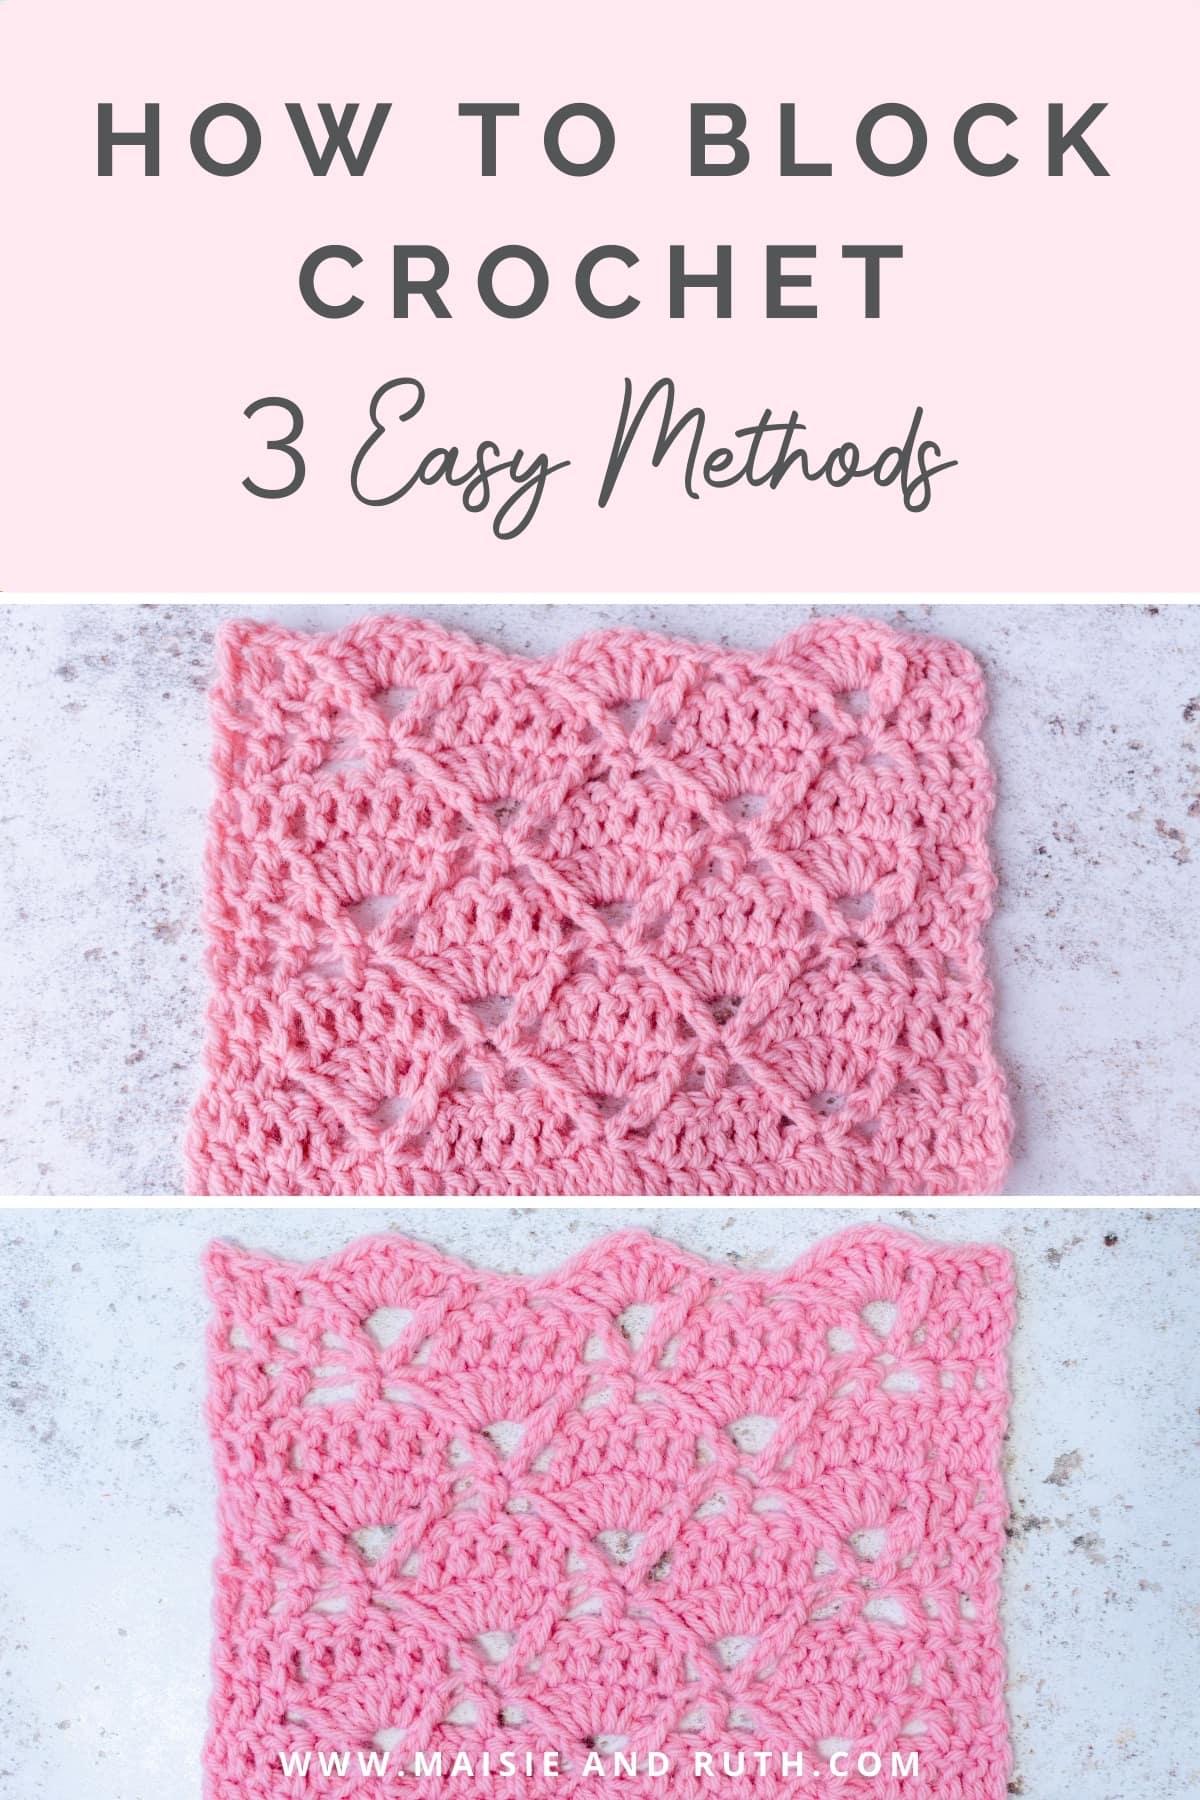 Block Crochet Pin Design 1